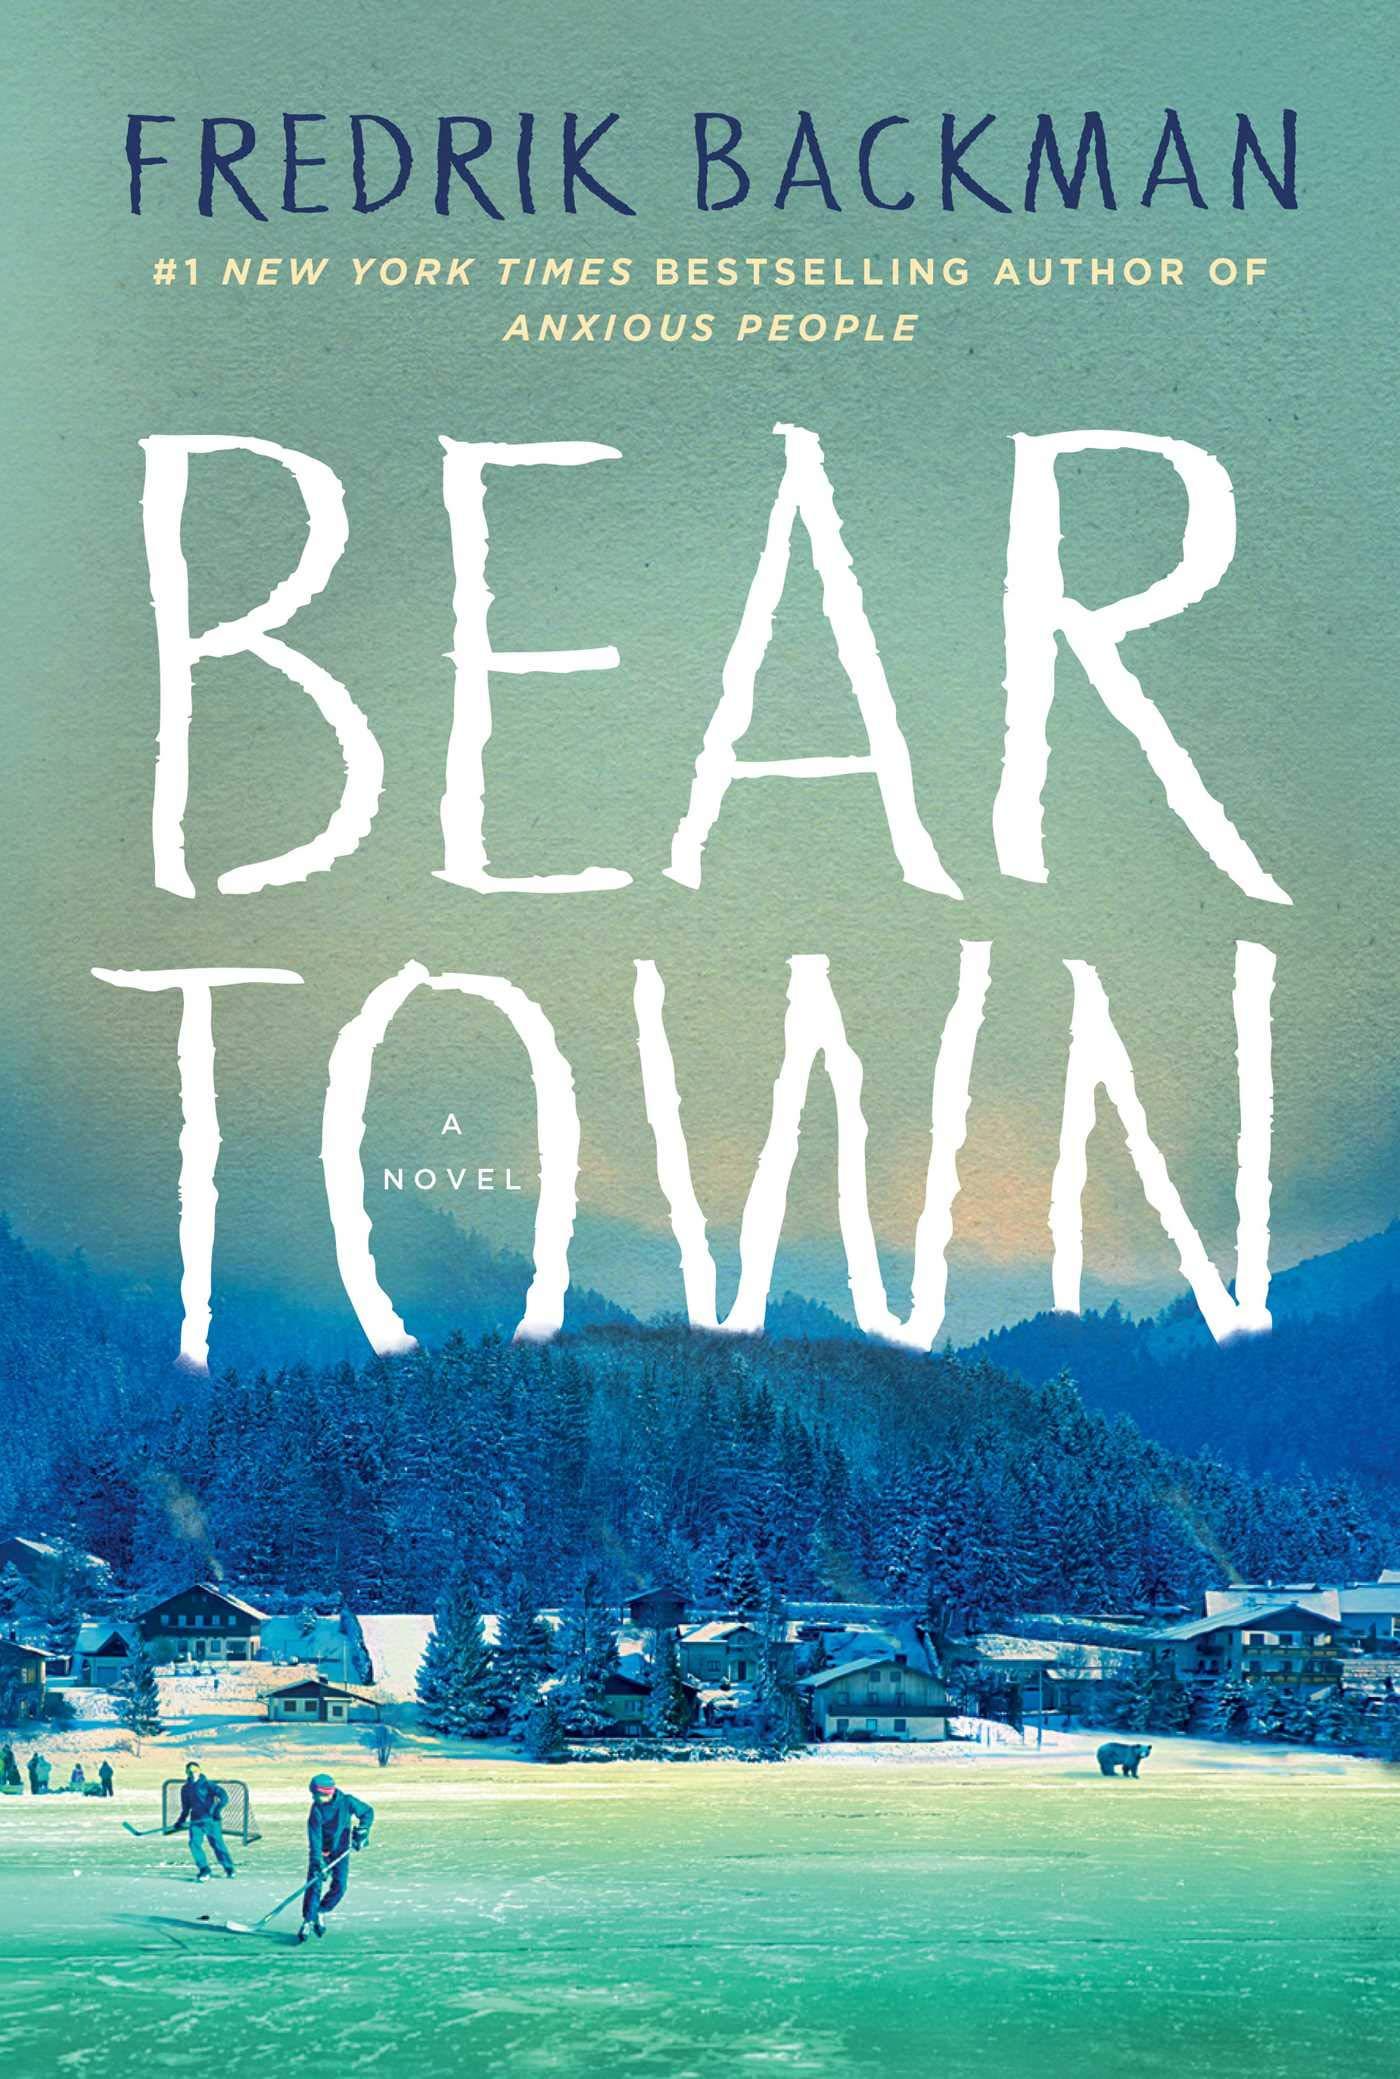 Beartown: A Novel: Backman, Fredrik: 9781501160769: Amazon.com: Books